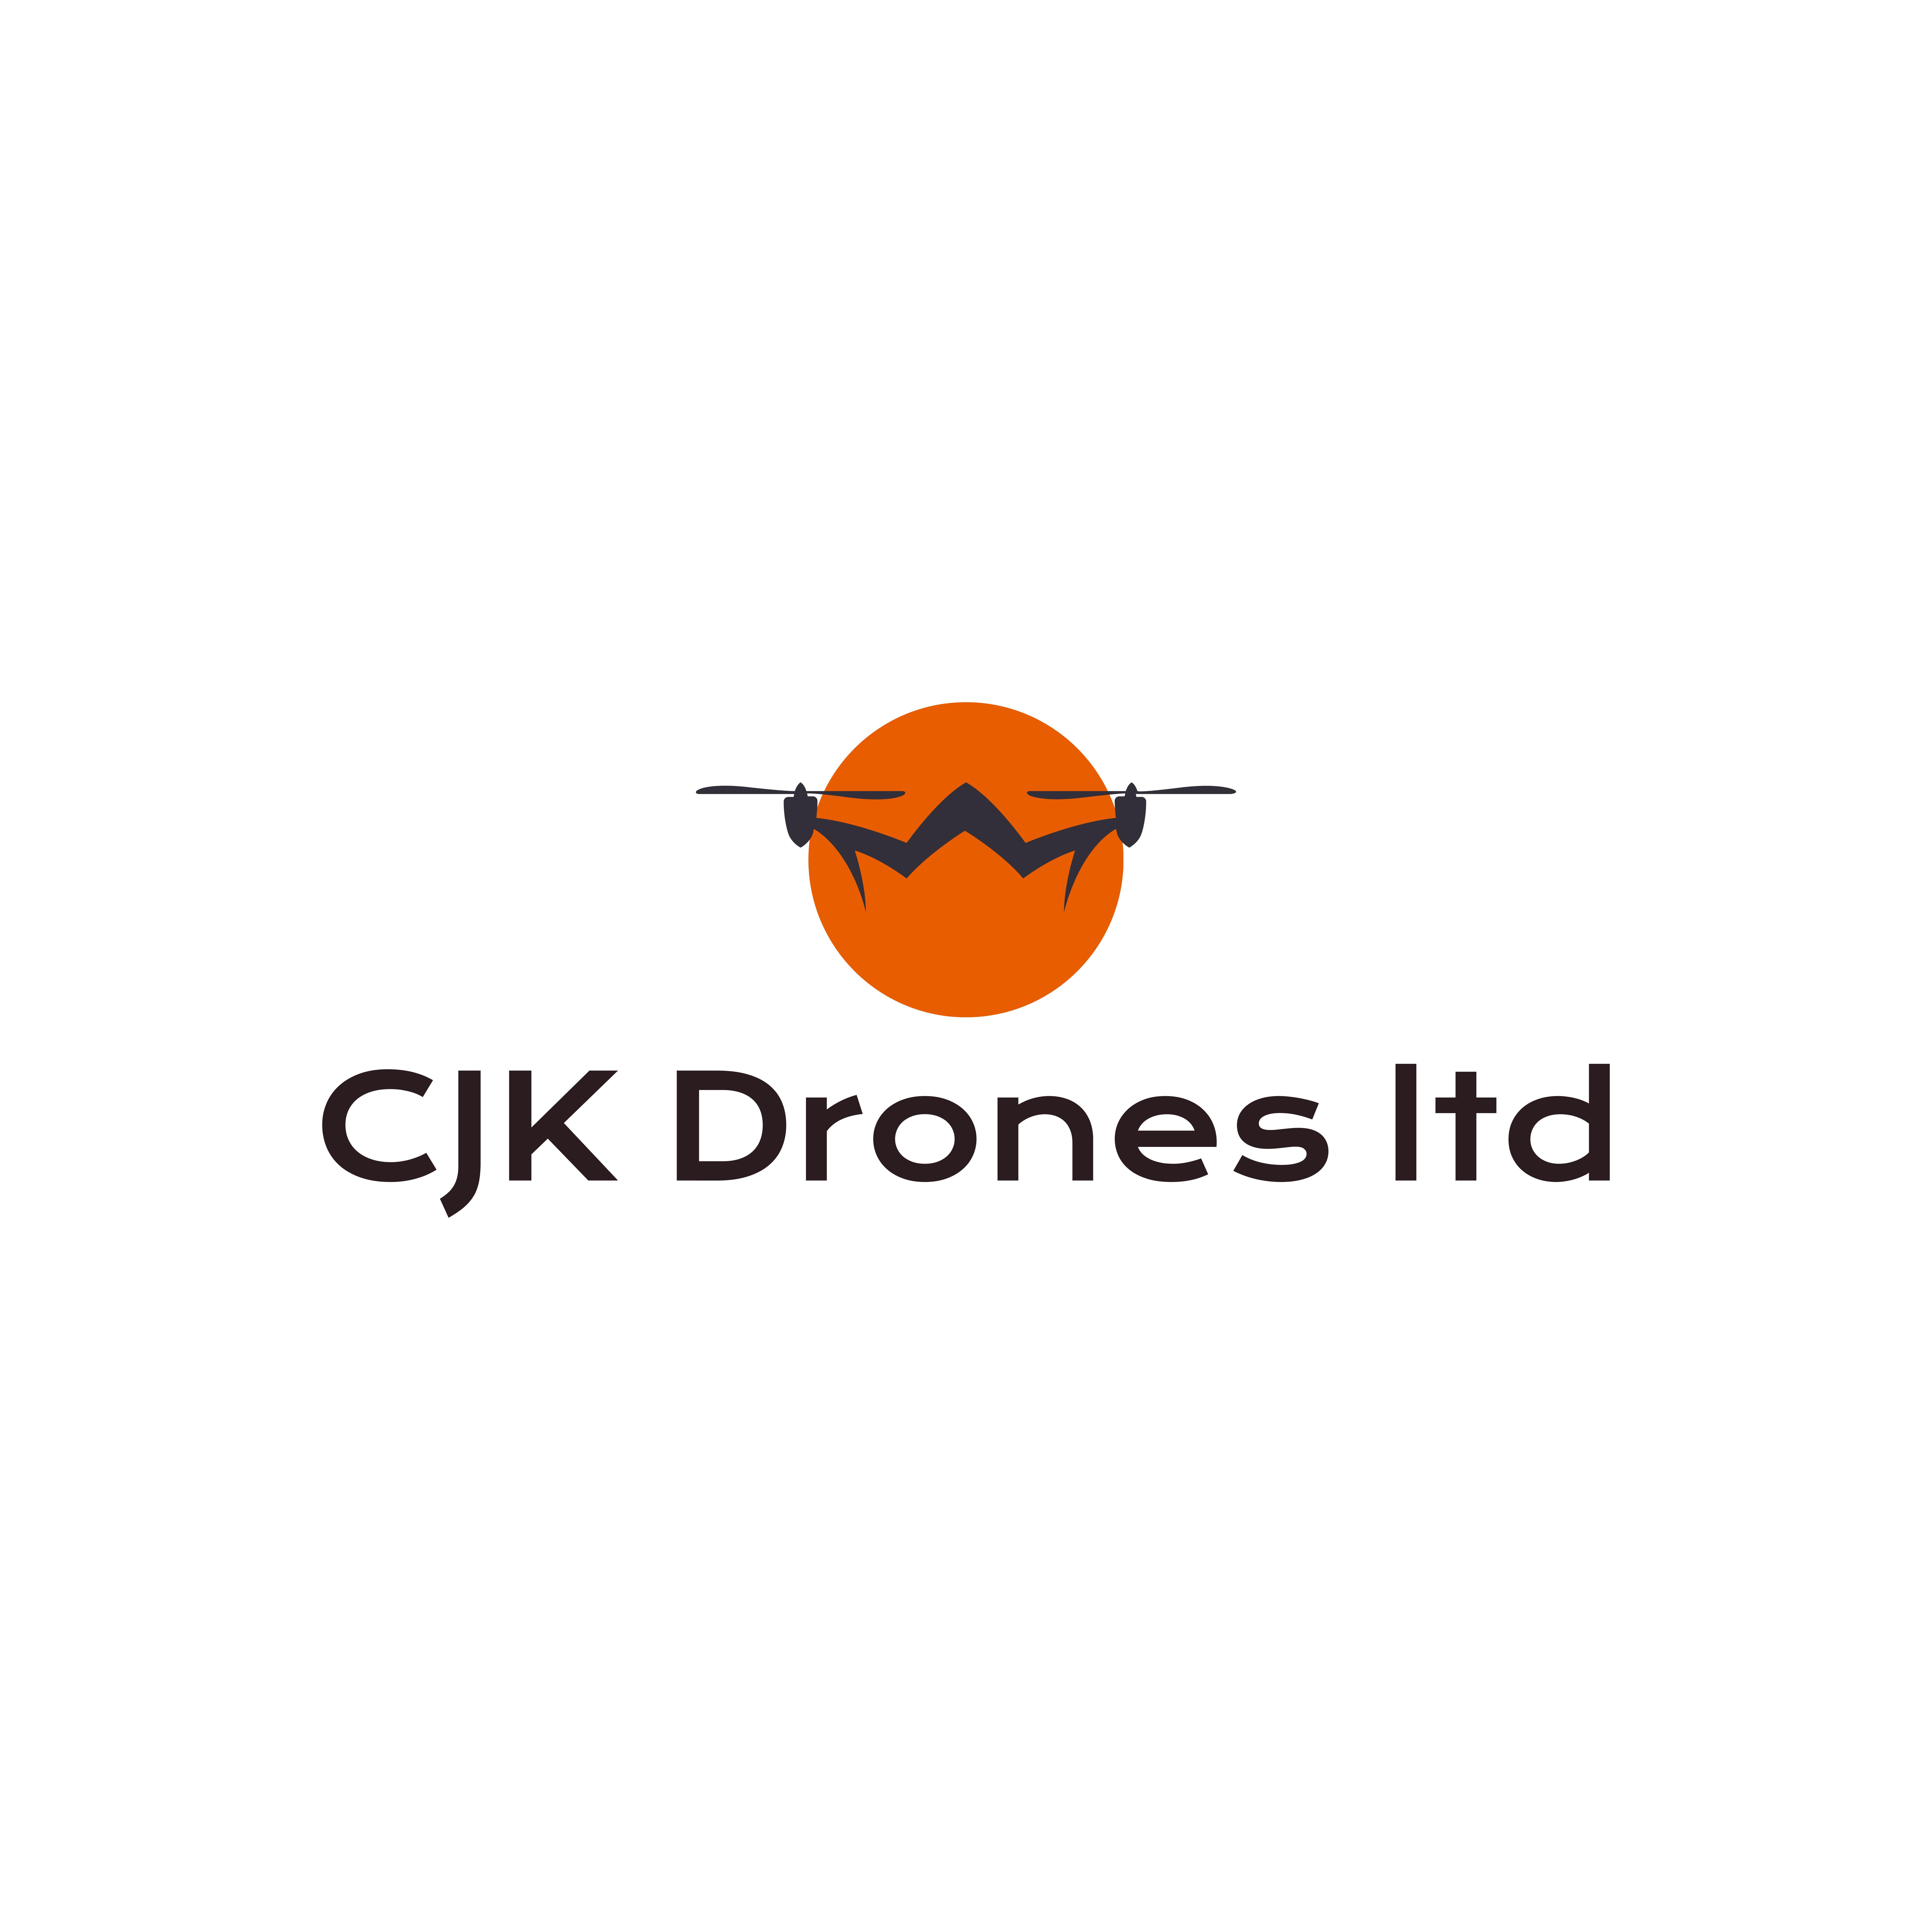 CJK Drones Ltd